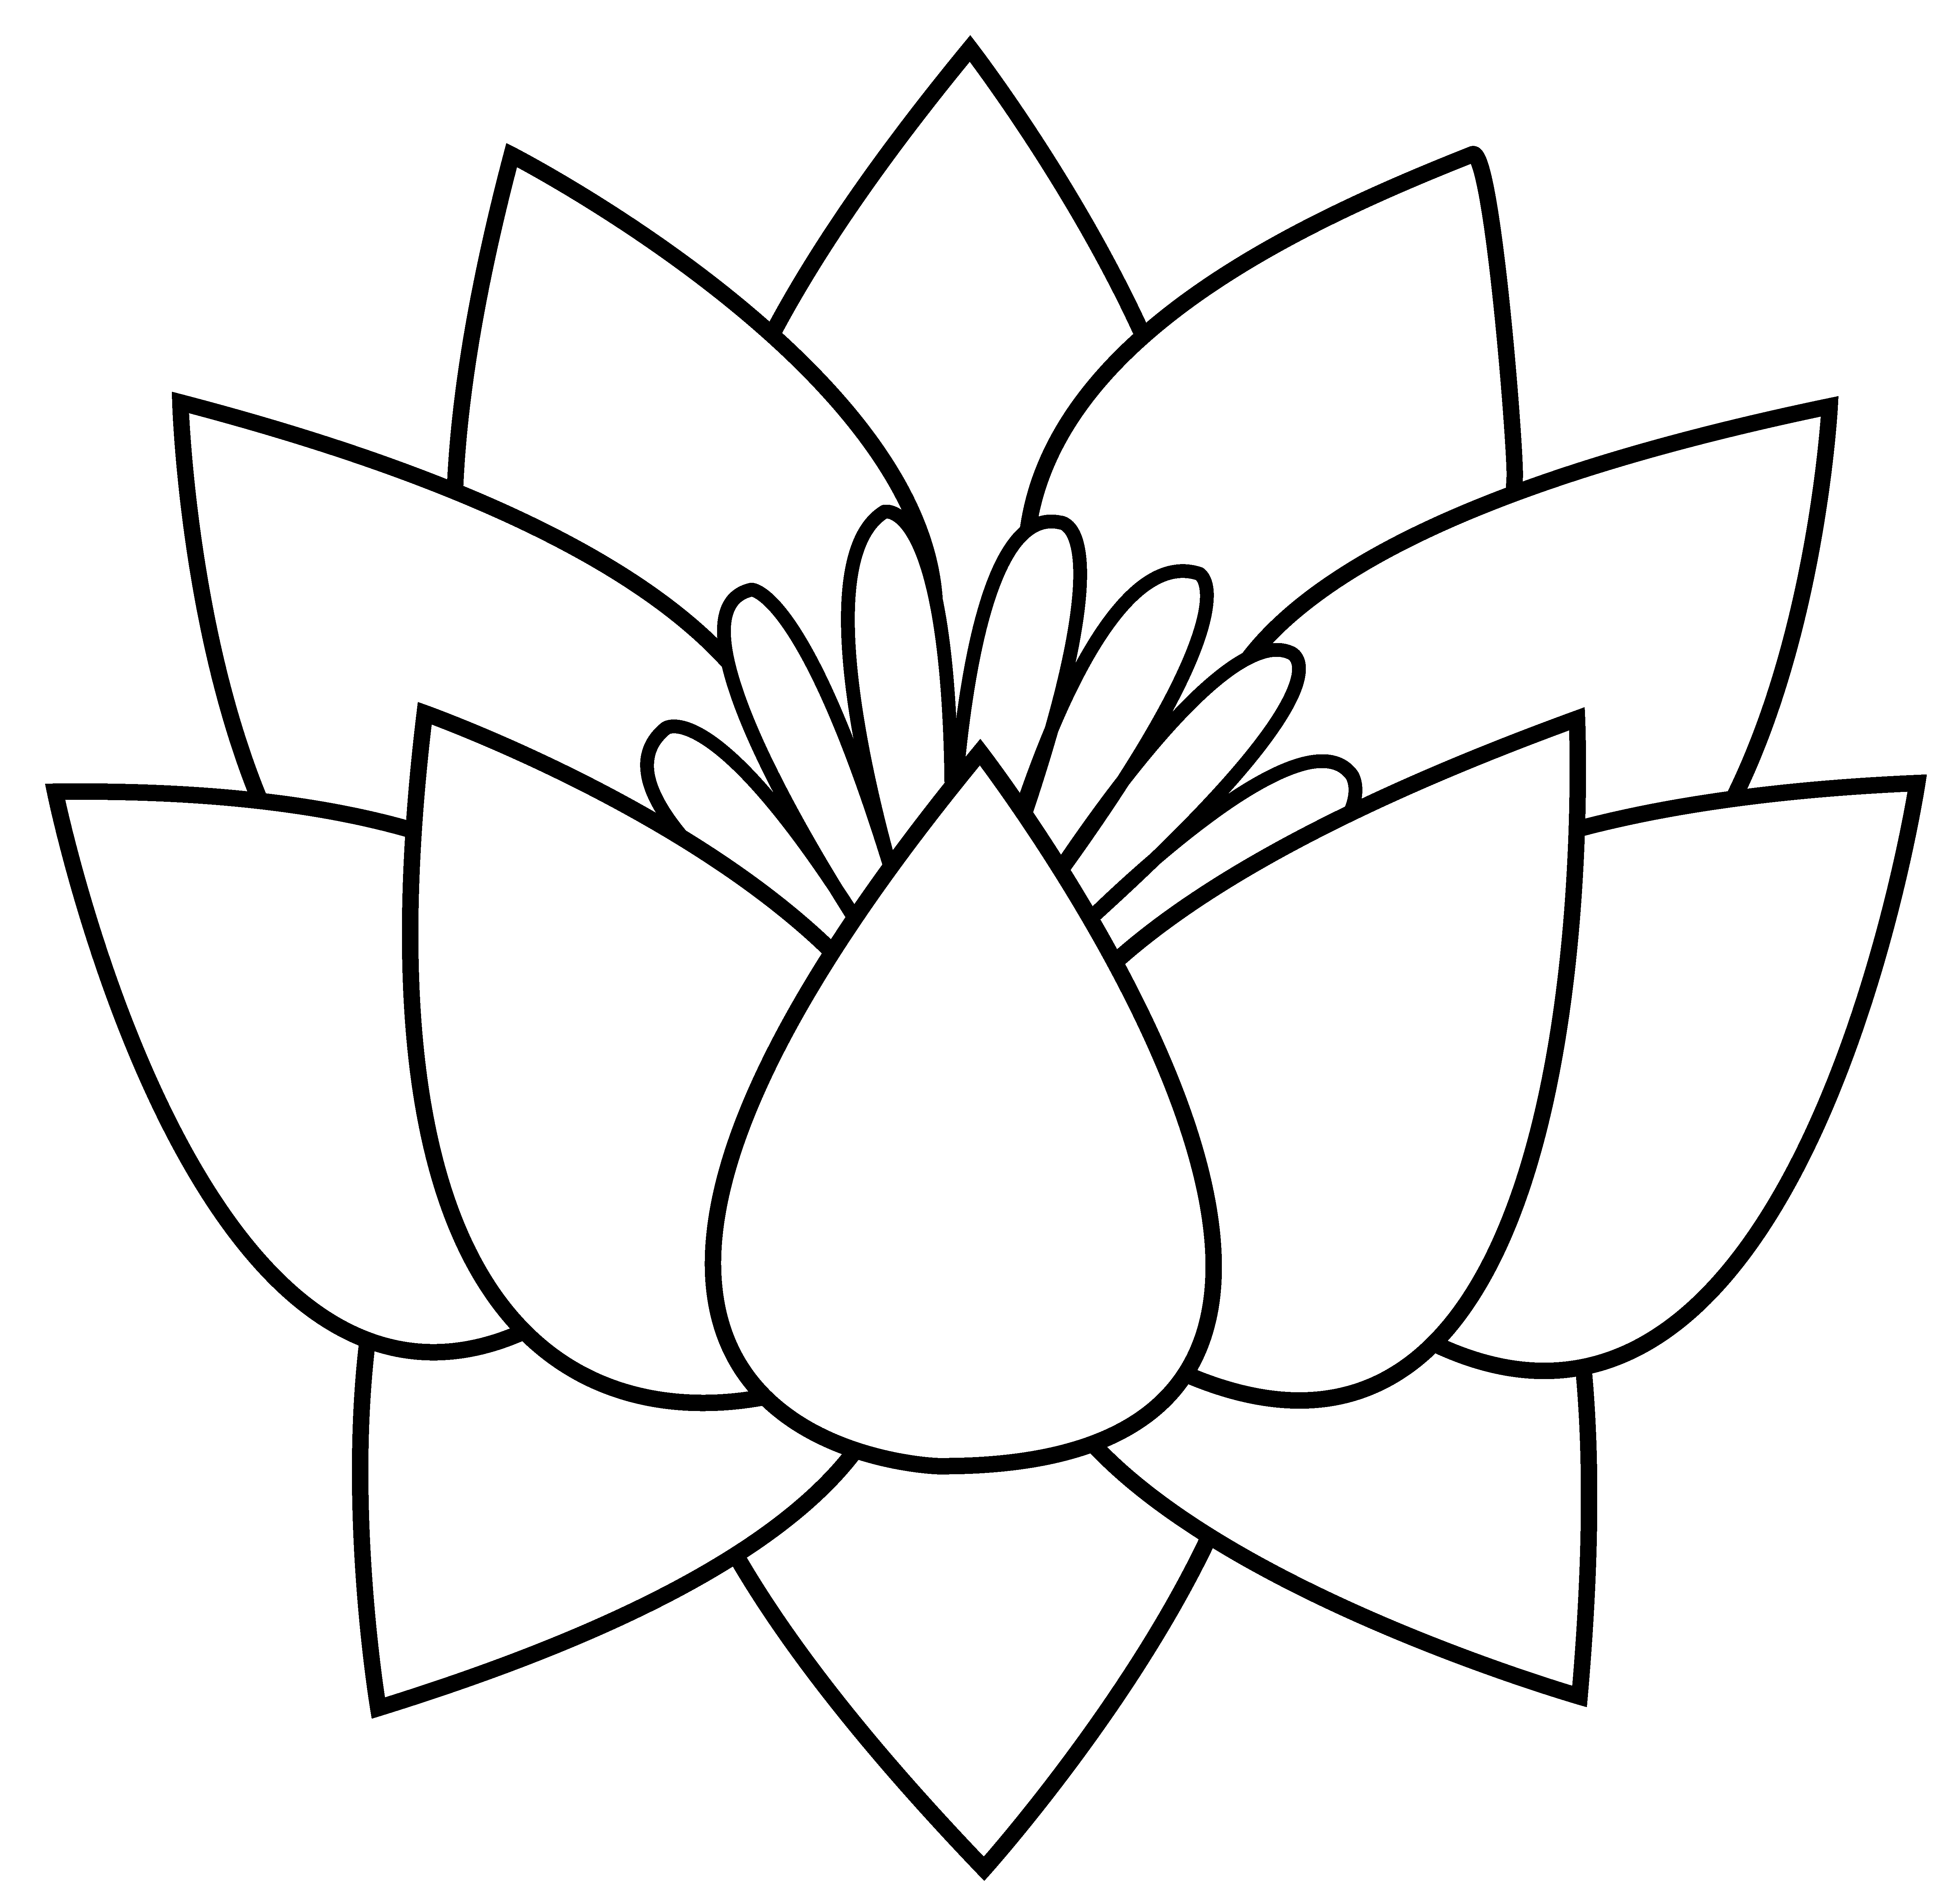 5953x5764 Free Line Art Drawings Flowers